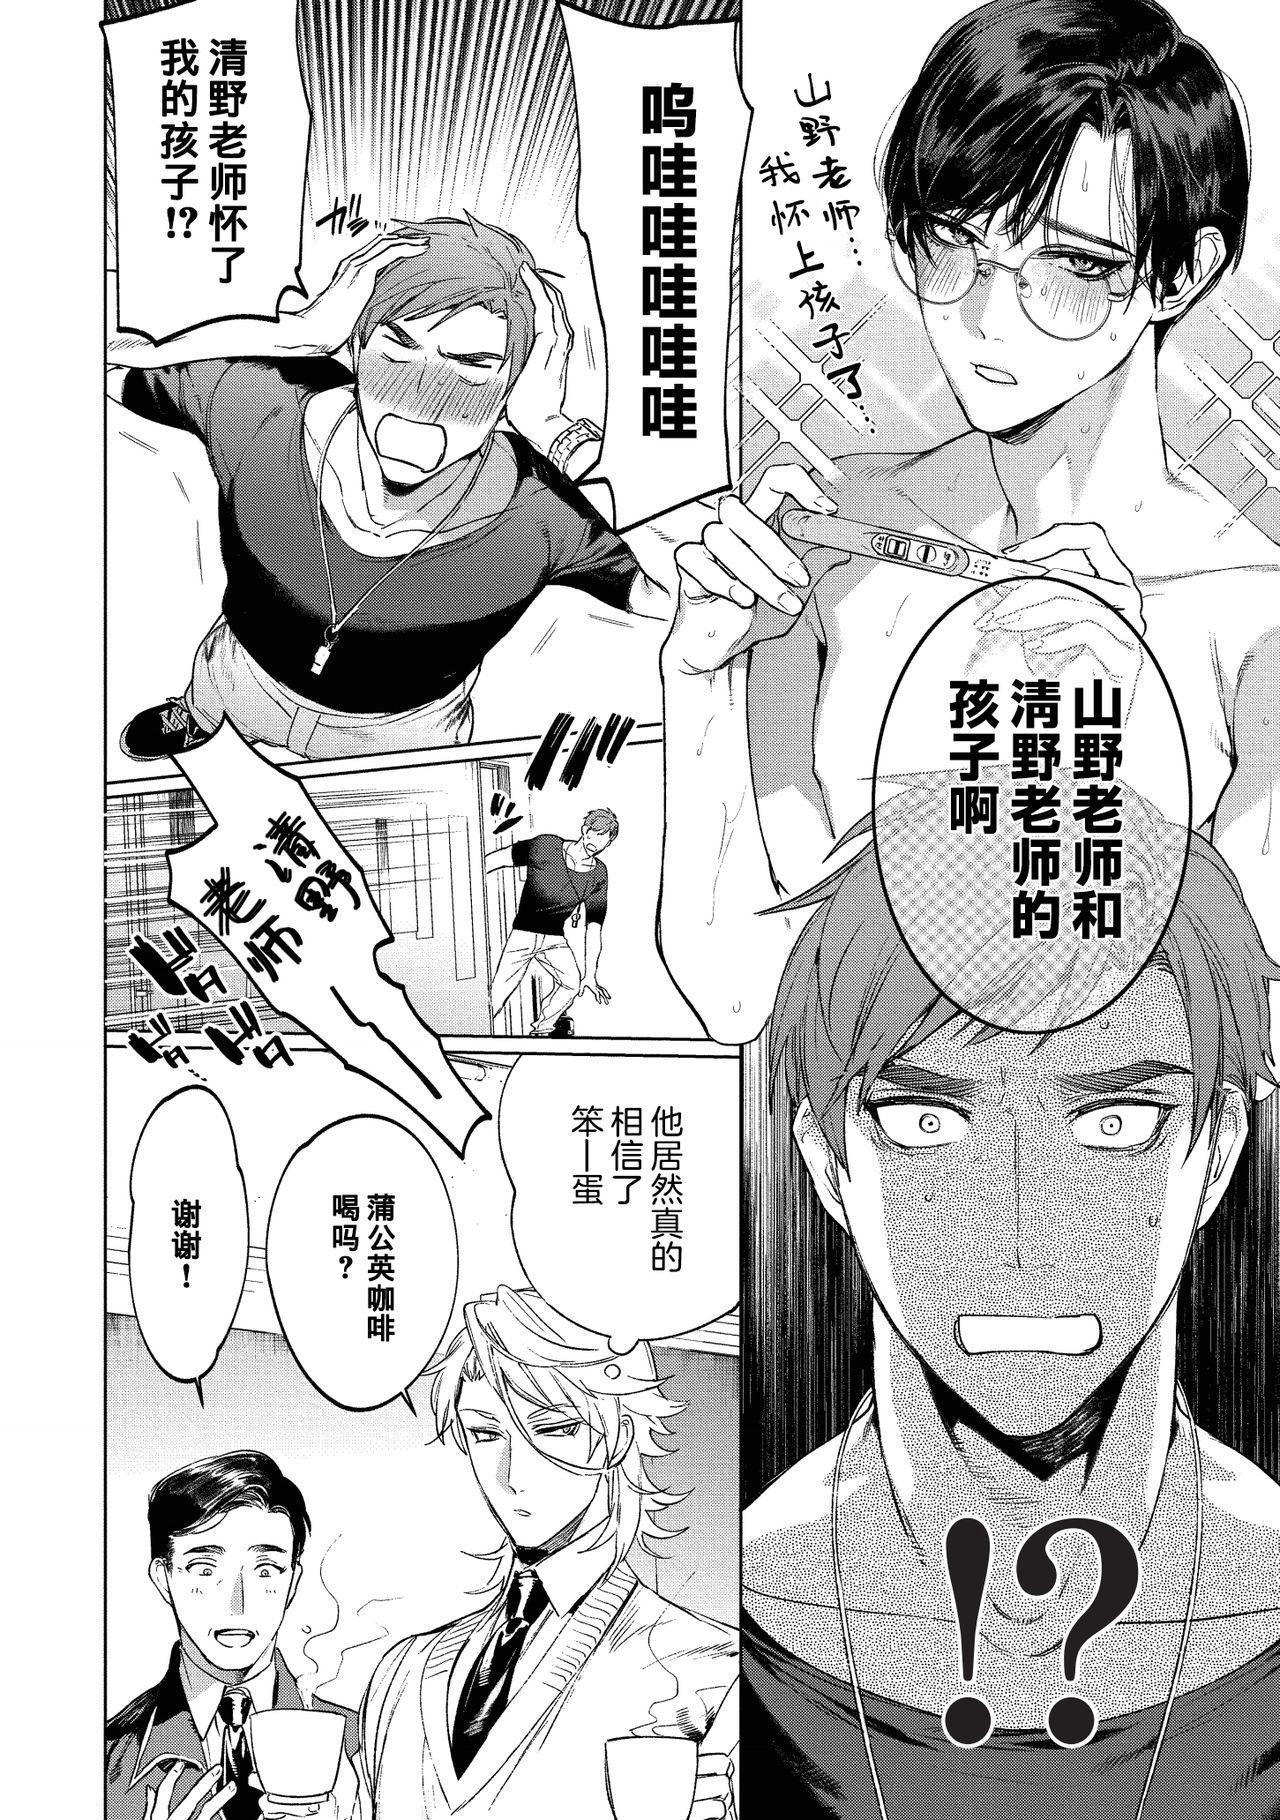 Sensei wa Benki ja Arimasen.3 | 老师不是便器。3 15